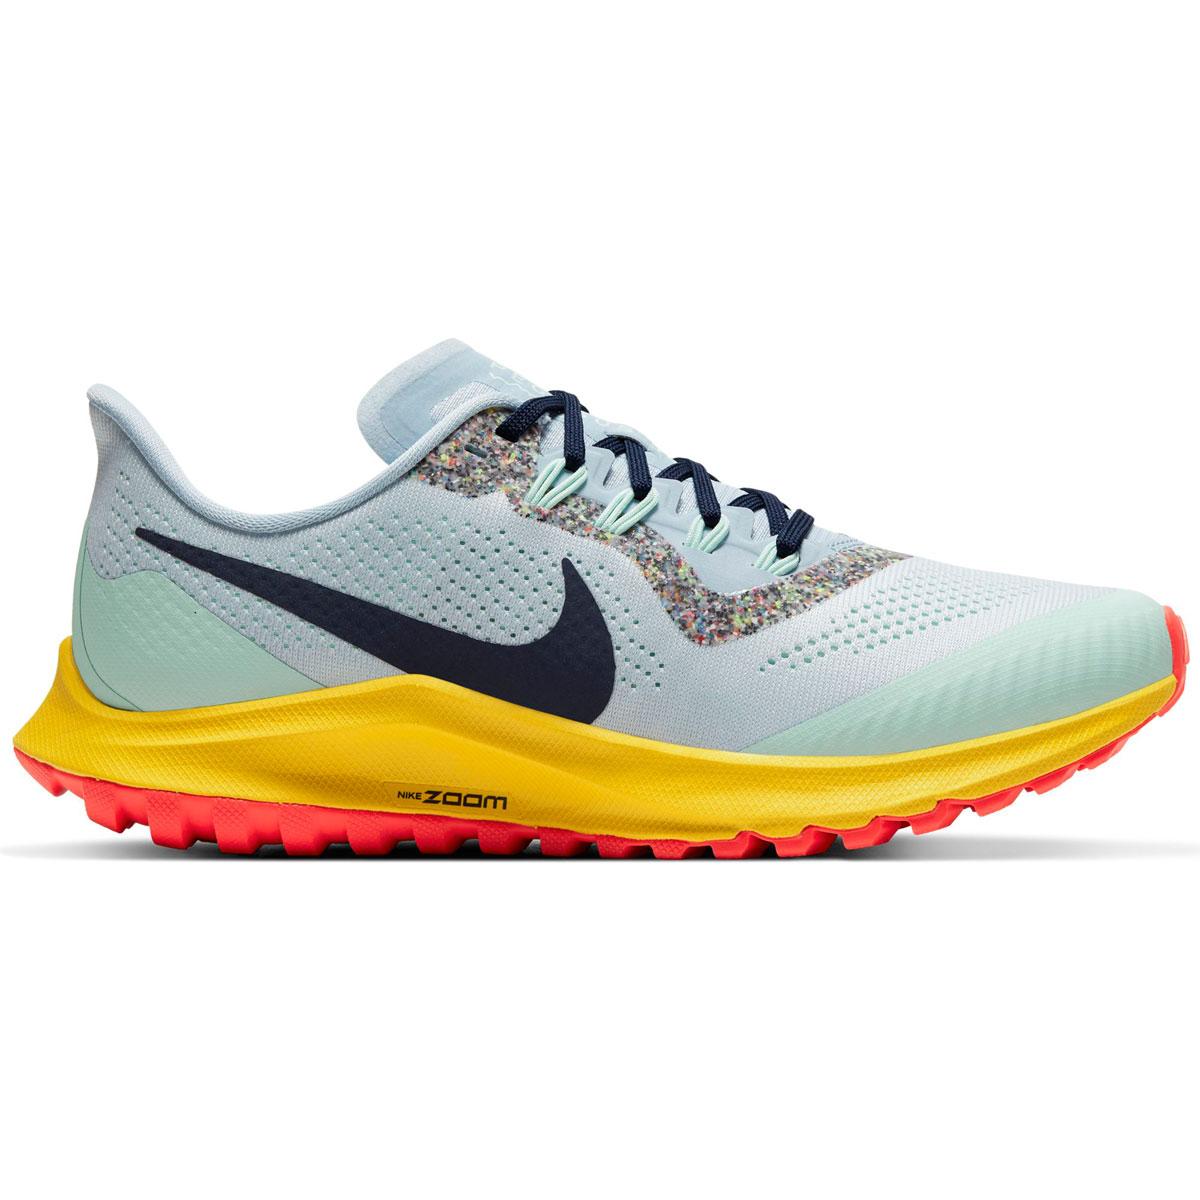 Women's Nike Air Zoom Pegasus 36 Trail Running Shoe - Color: Aura/Blackened Blue/Light Armory (Regular Width) - Size: 5, Aura/Blackened Blue/Light Armory, large, image 1